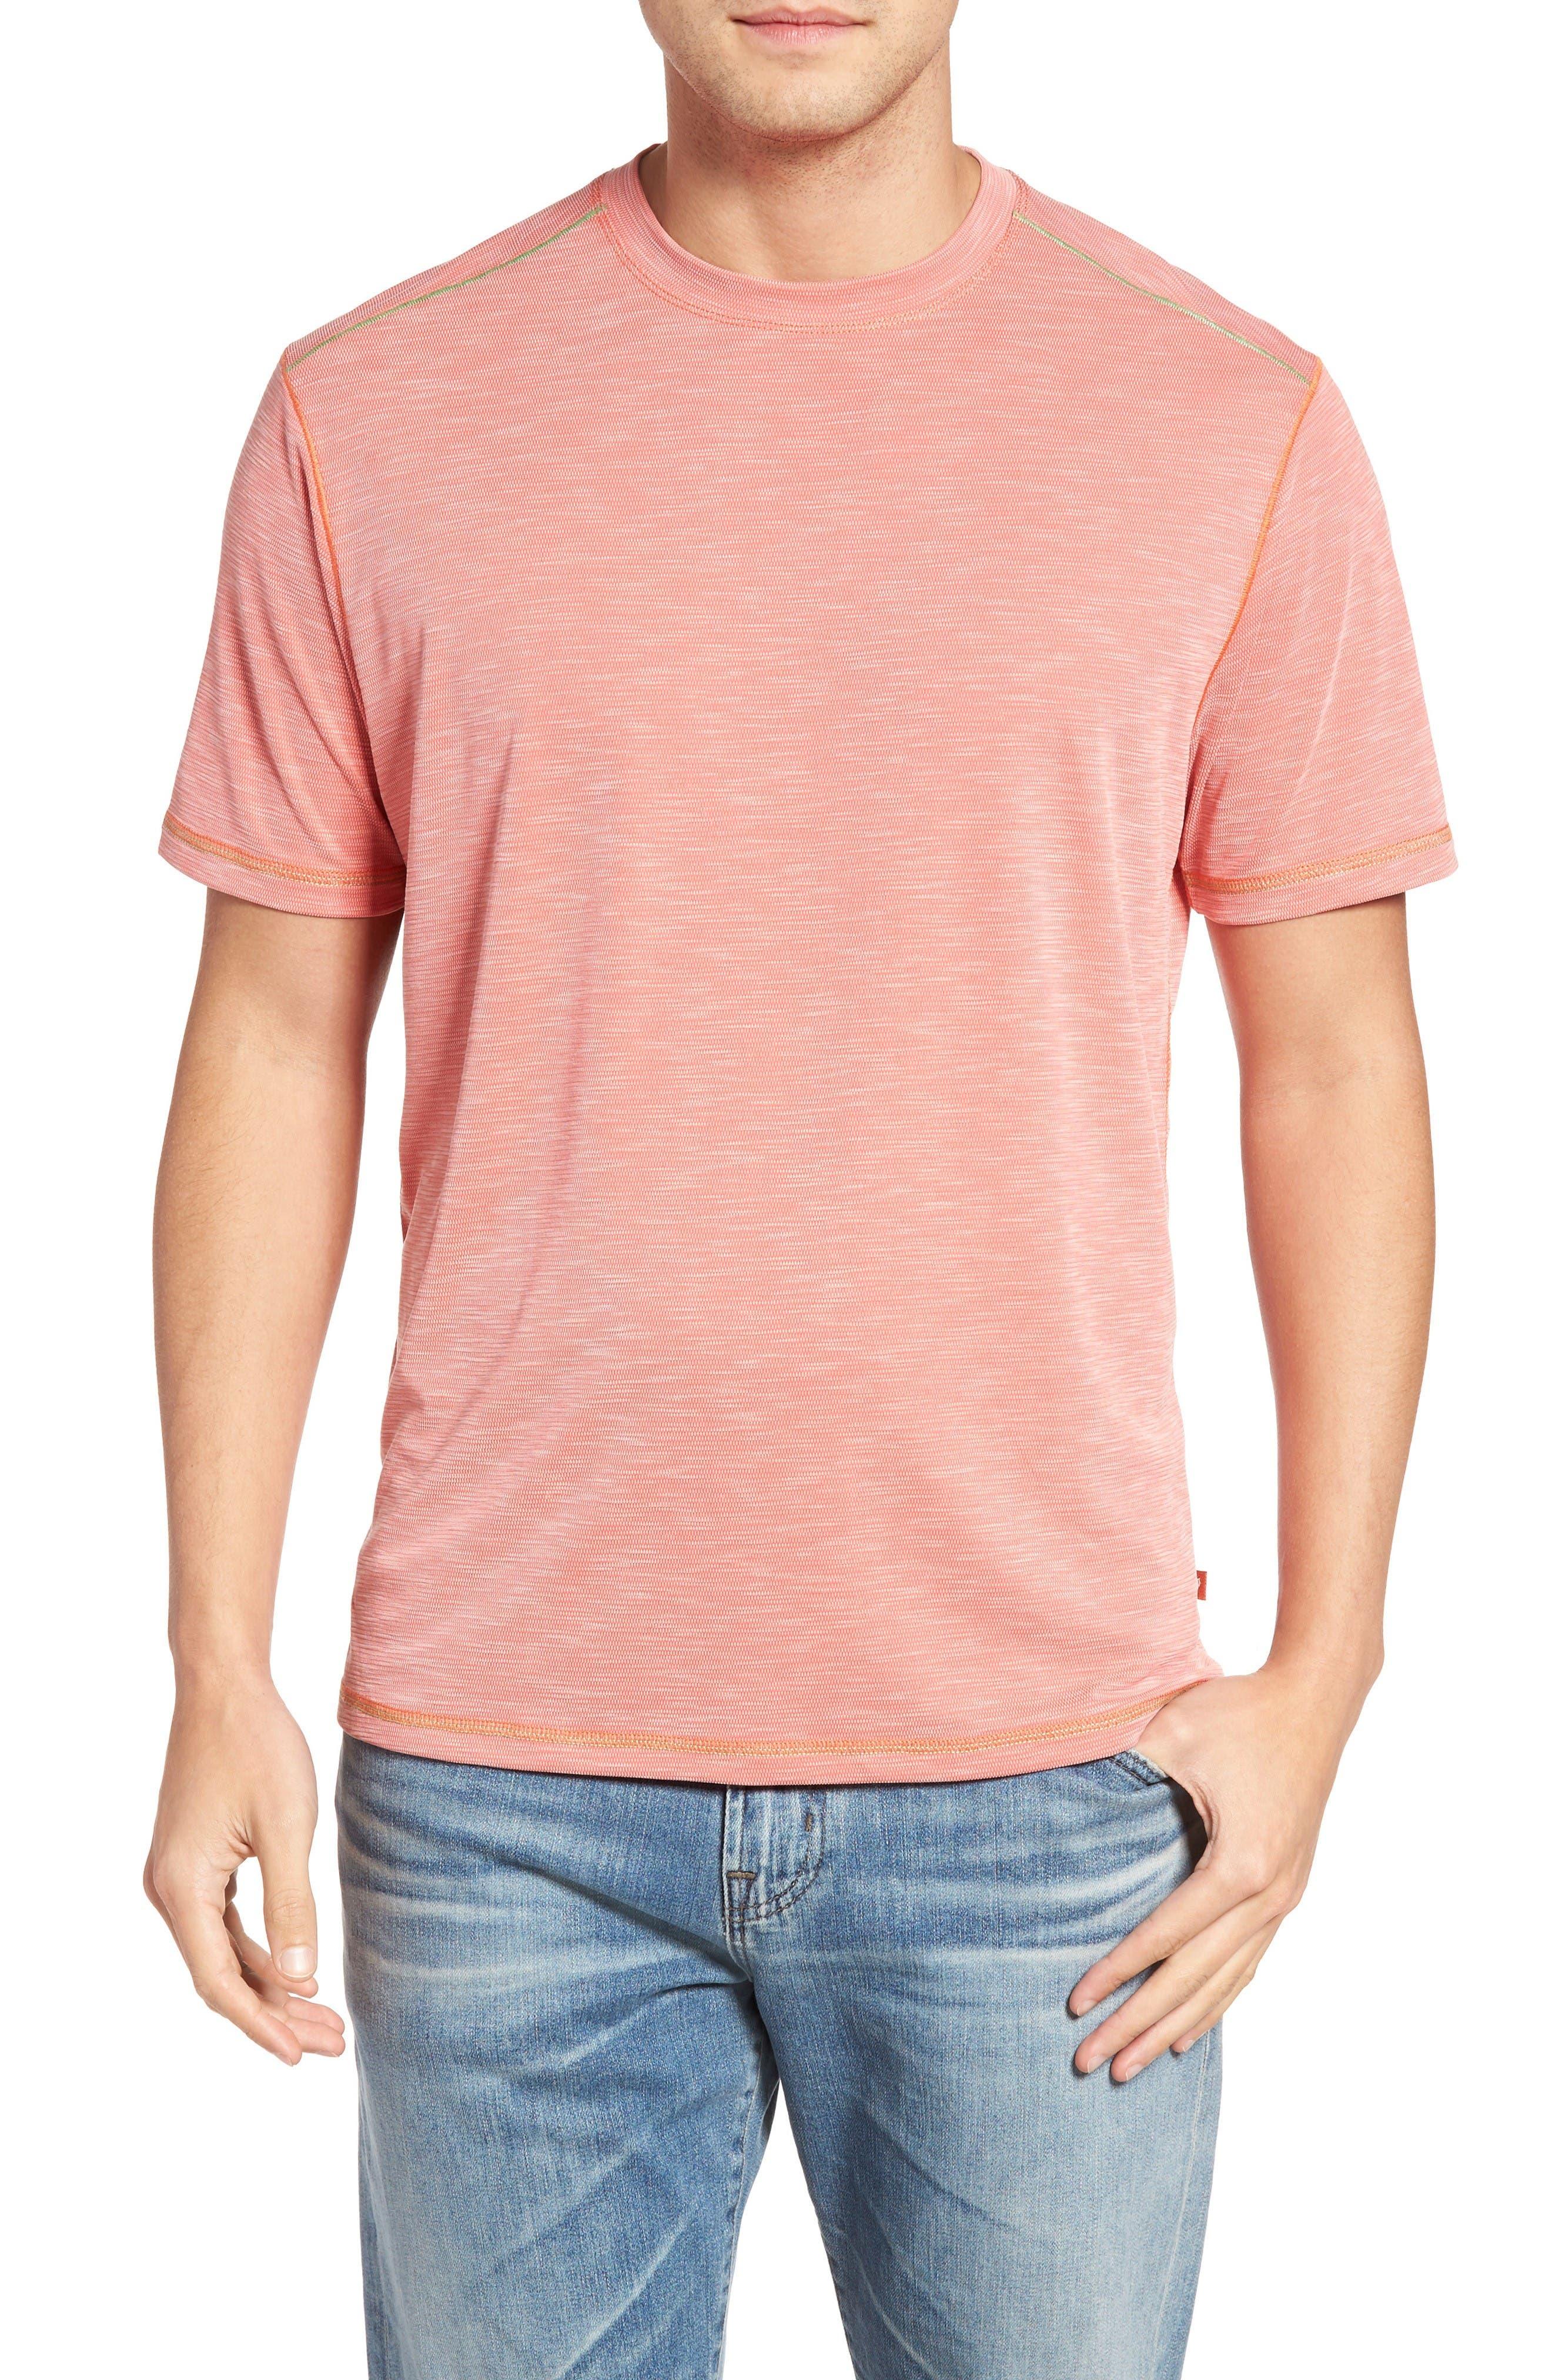 Paradise Around Crewneck T-Shirt,                             Main thumbnail 1, color,                             Fusion